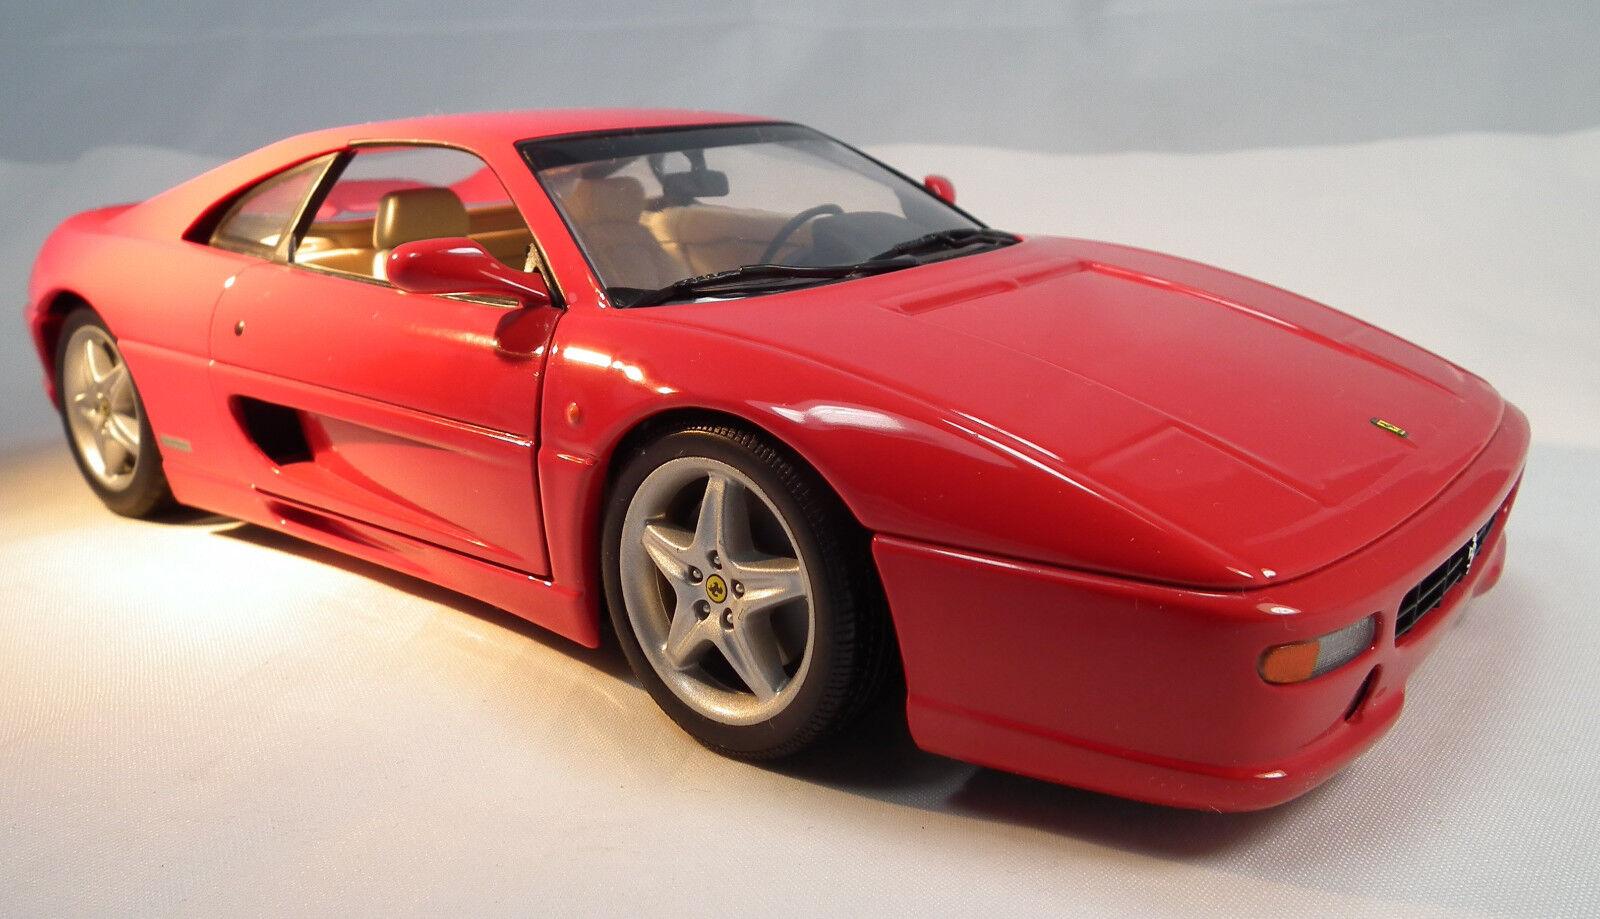 Ferrari F355 berlinetta von UT models im Maßstab 1 18  Modellauto